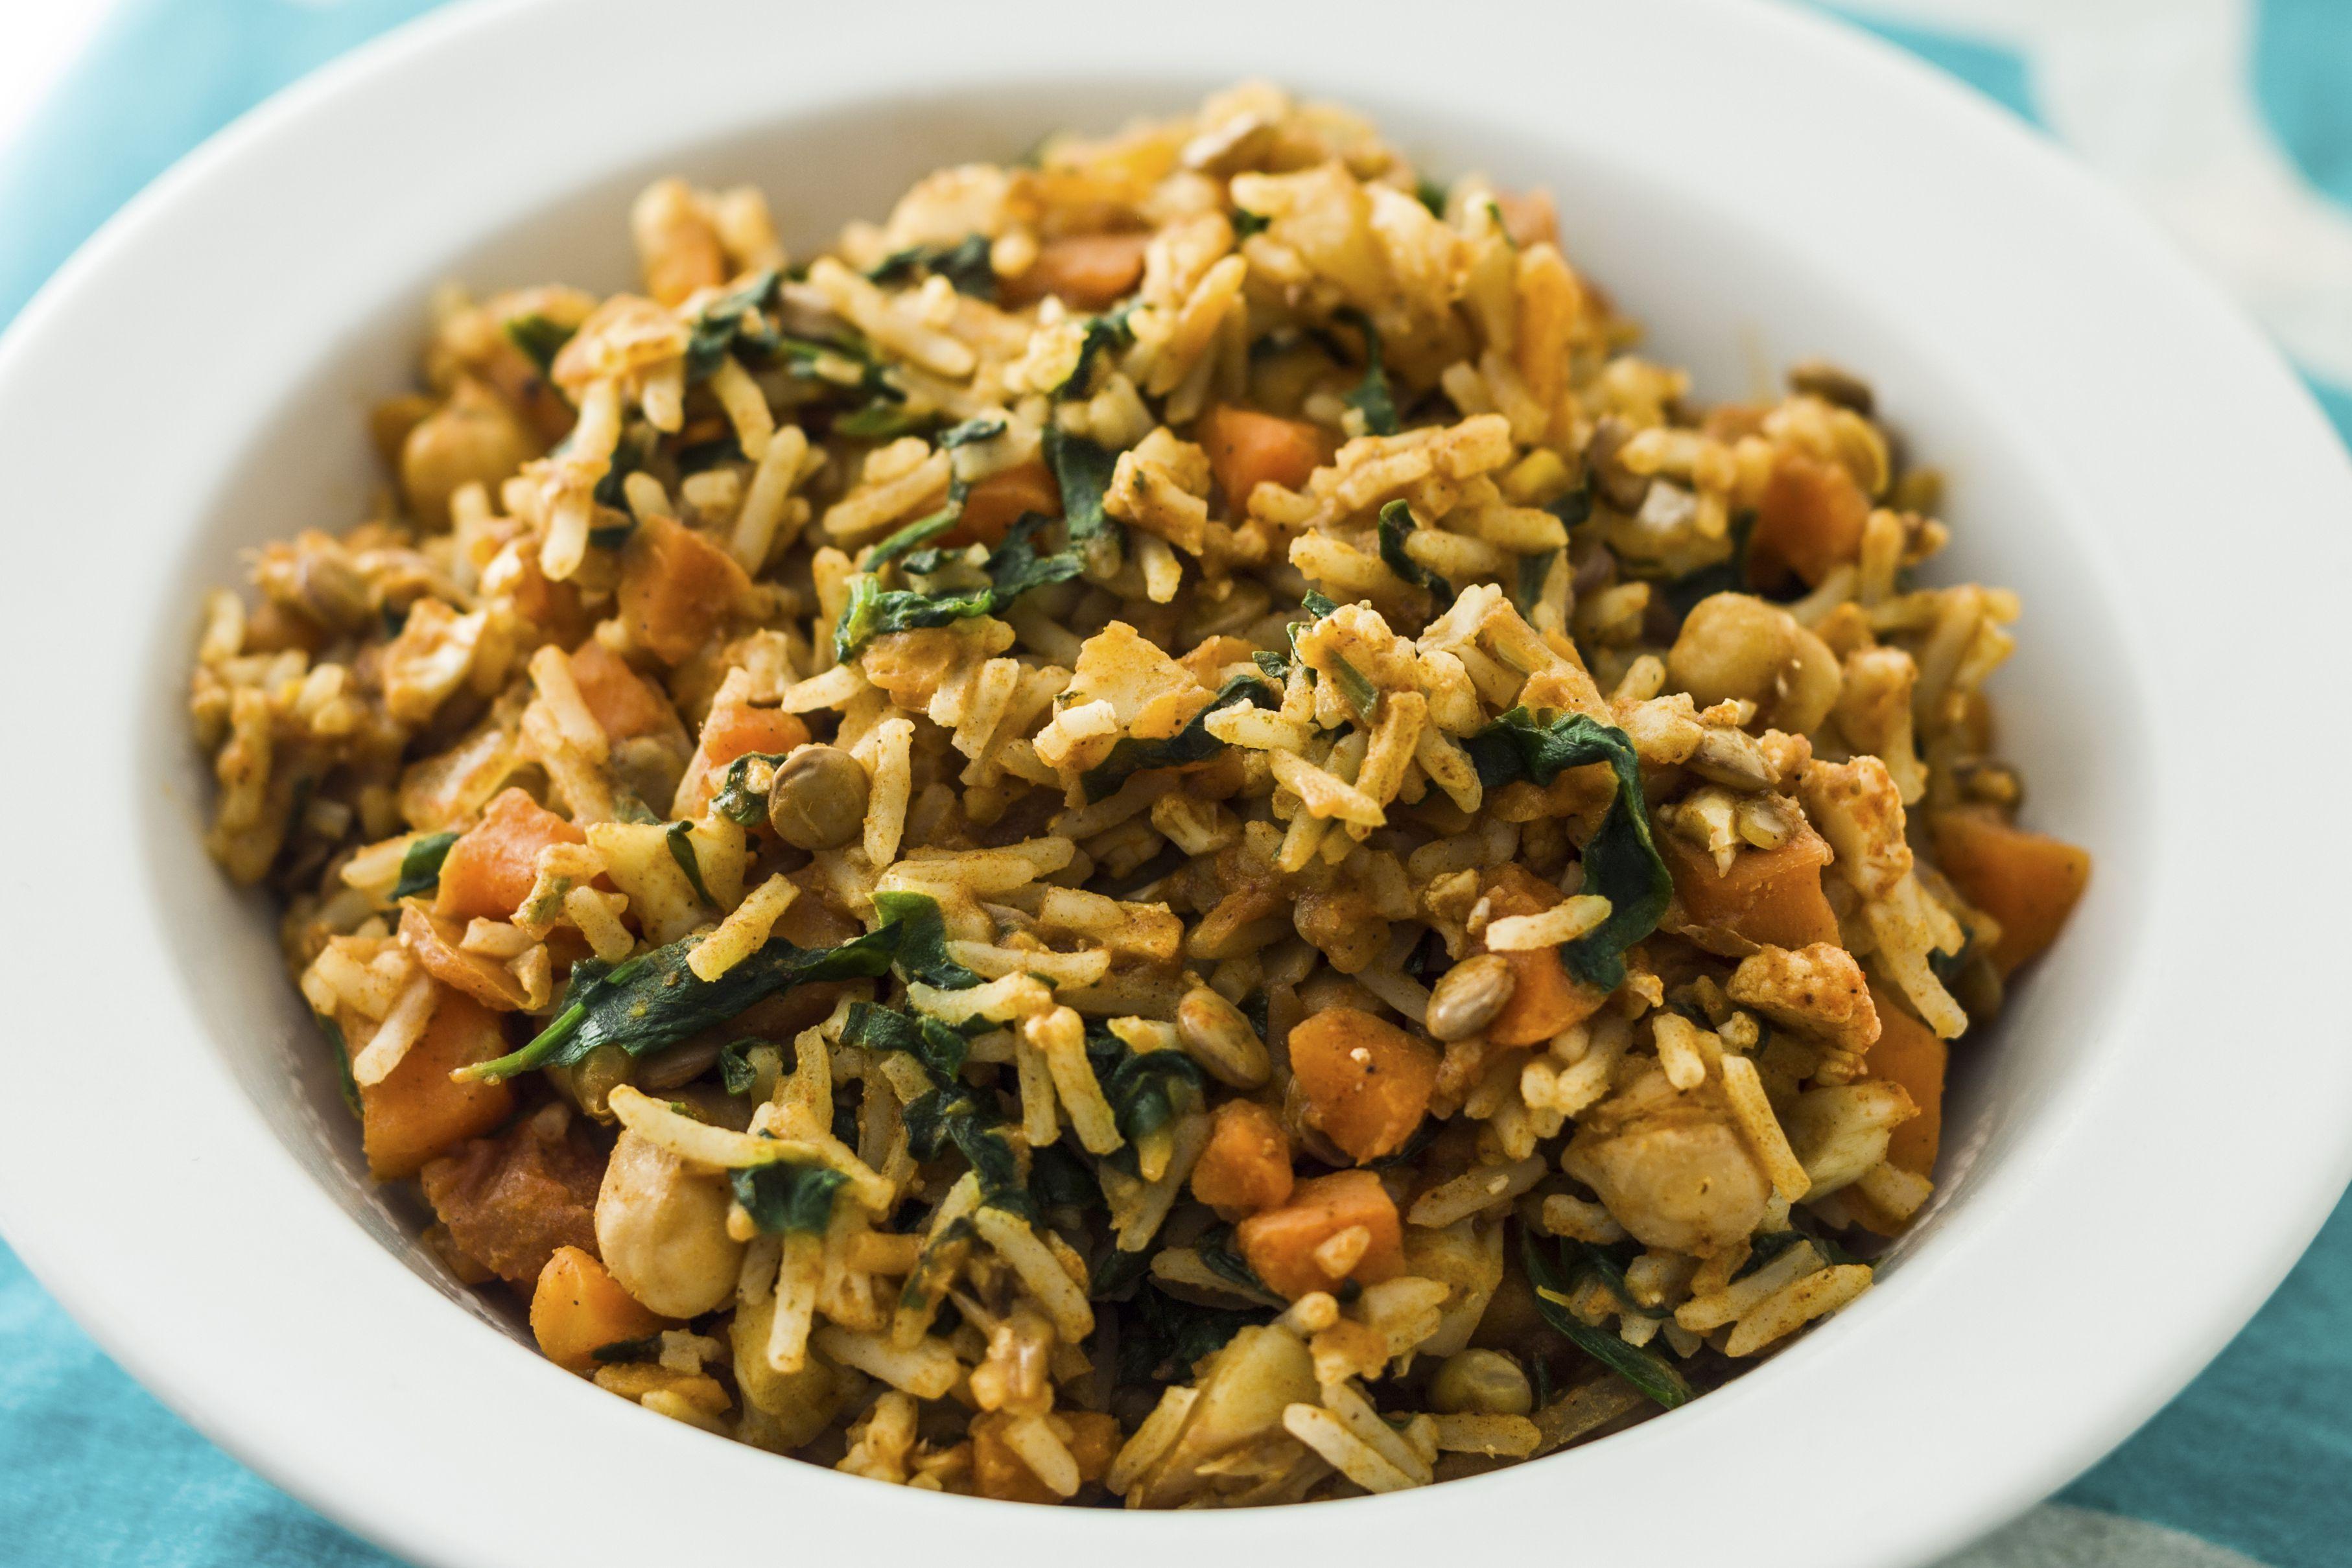 Vegan Crock Pot Curried Rice and Lentils